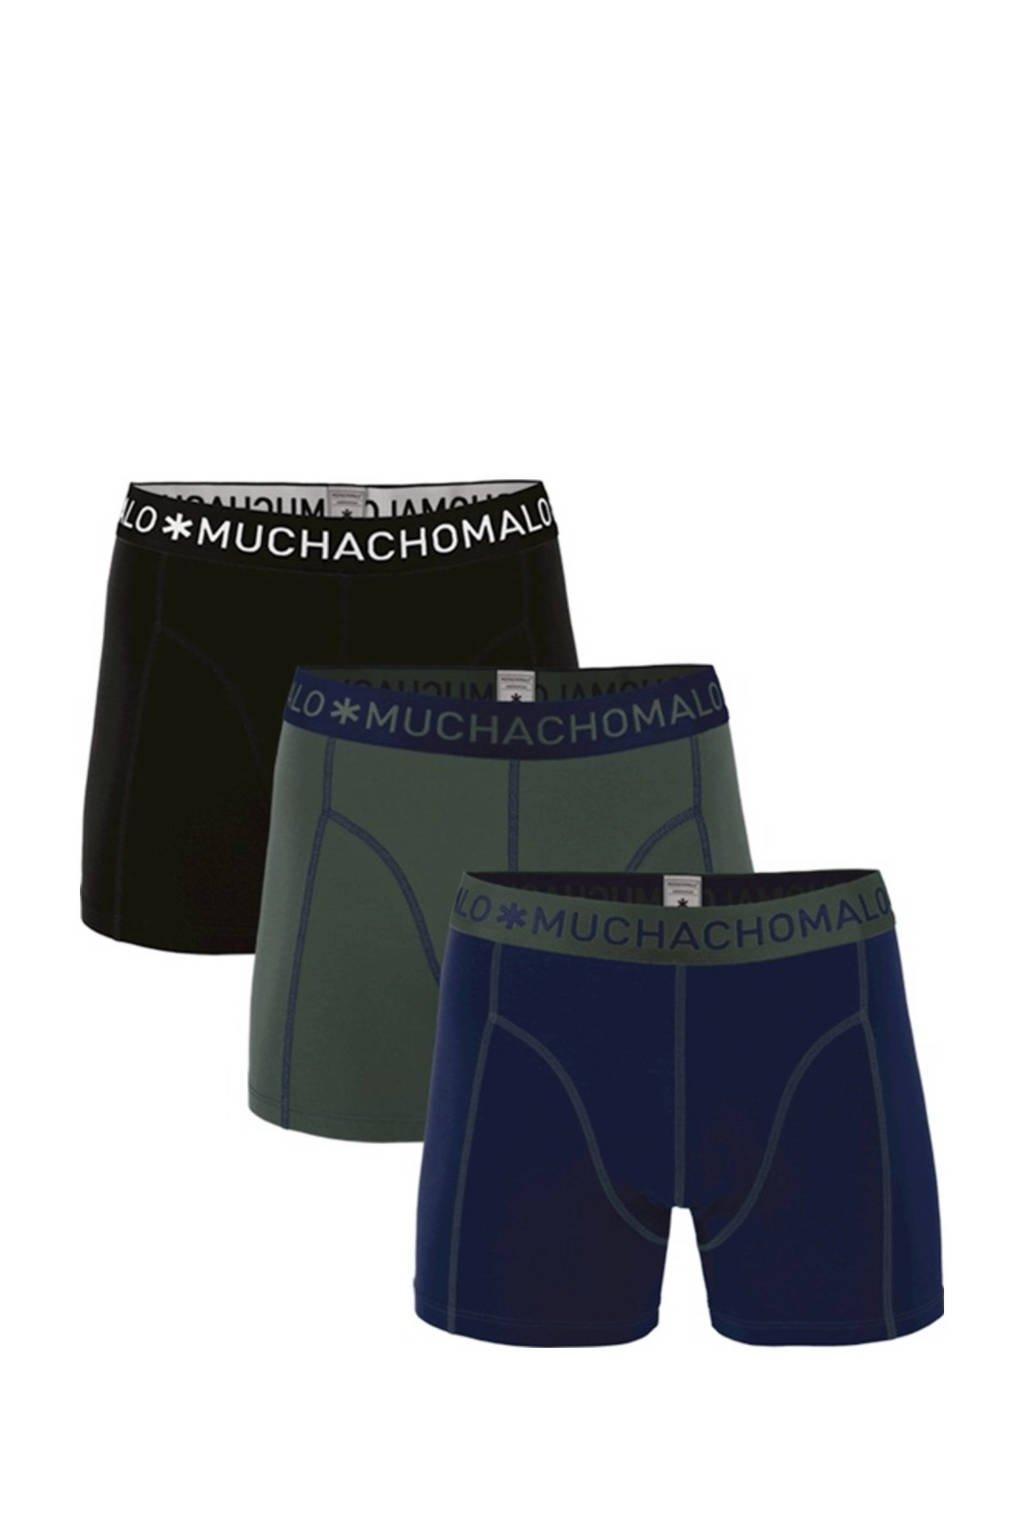 Muchachomalo   boxershort -set van 3 donkerblauw/army/zwart, Donkerblauw/armygroen/zwart